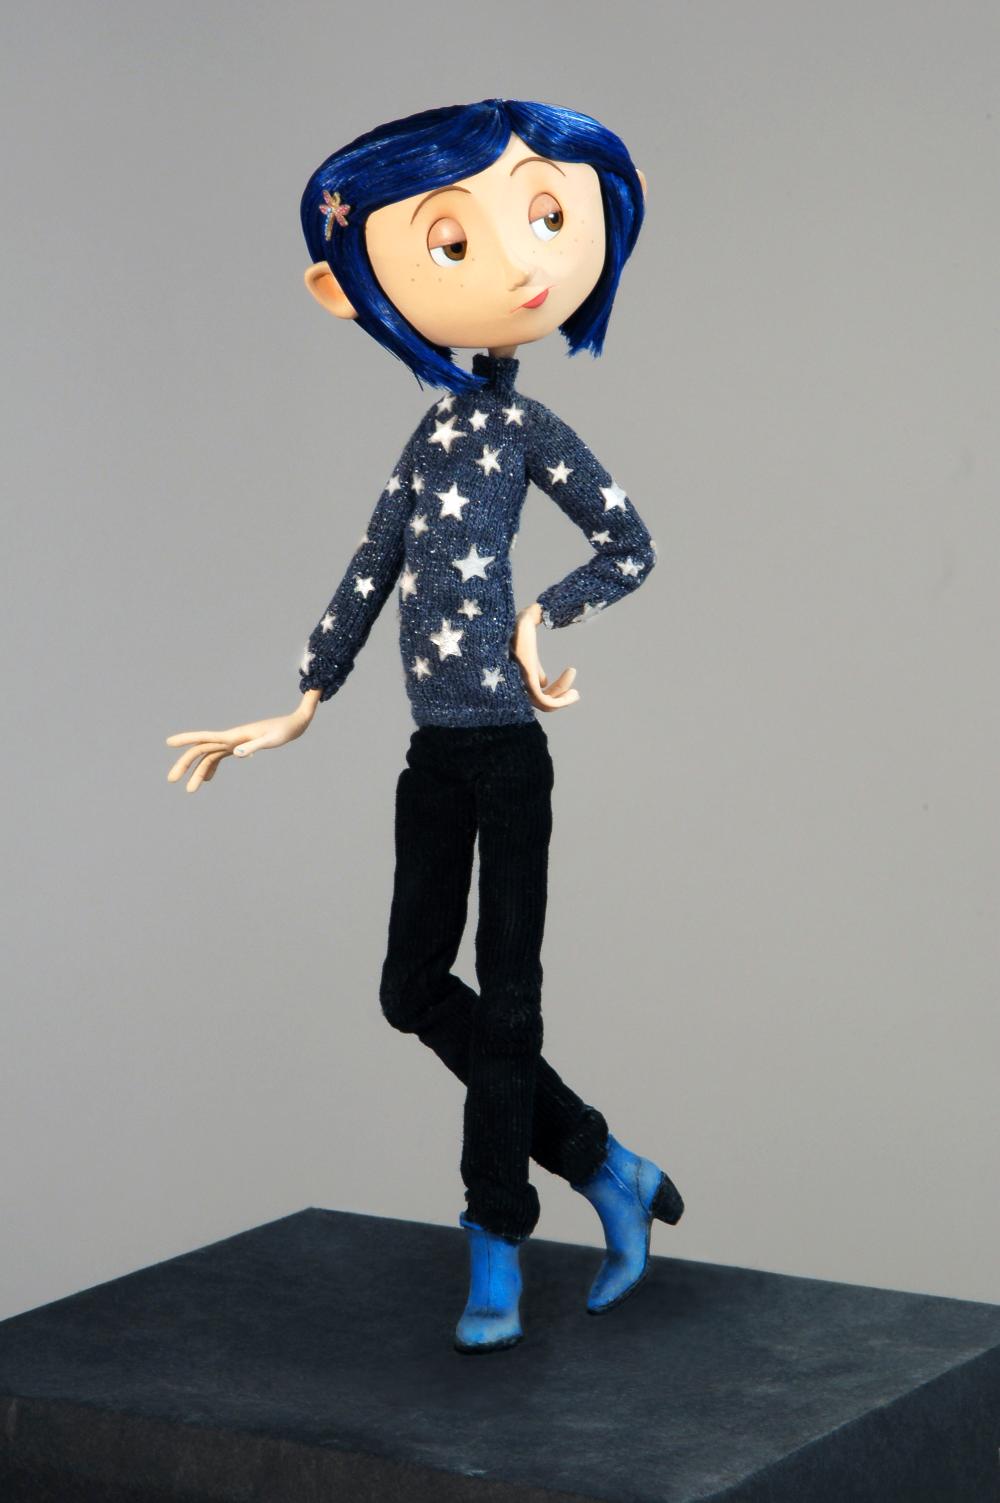 Coraline Star Outfit Google Search Coraline Muneca Fondo De Pantalla Halloween Como Dibujar A Sonic